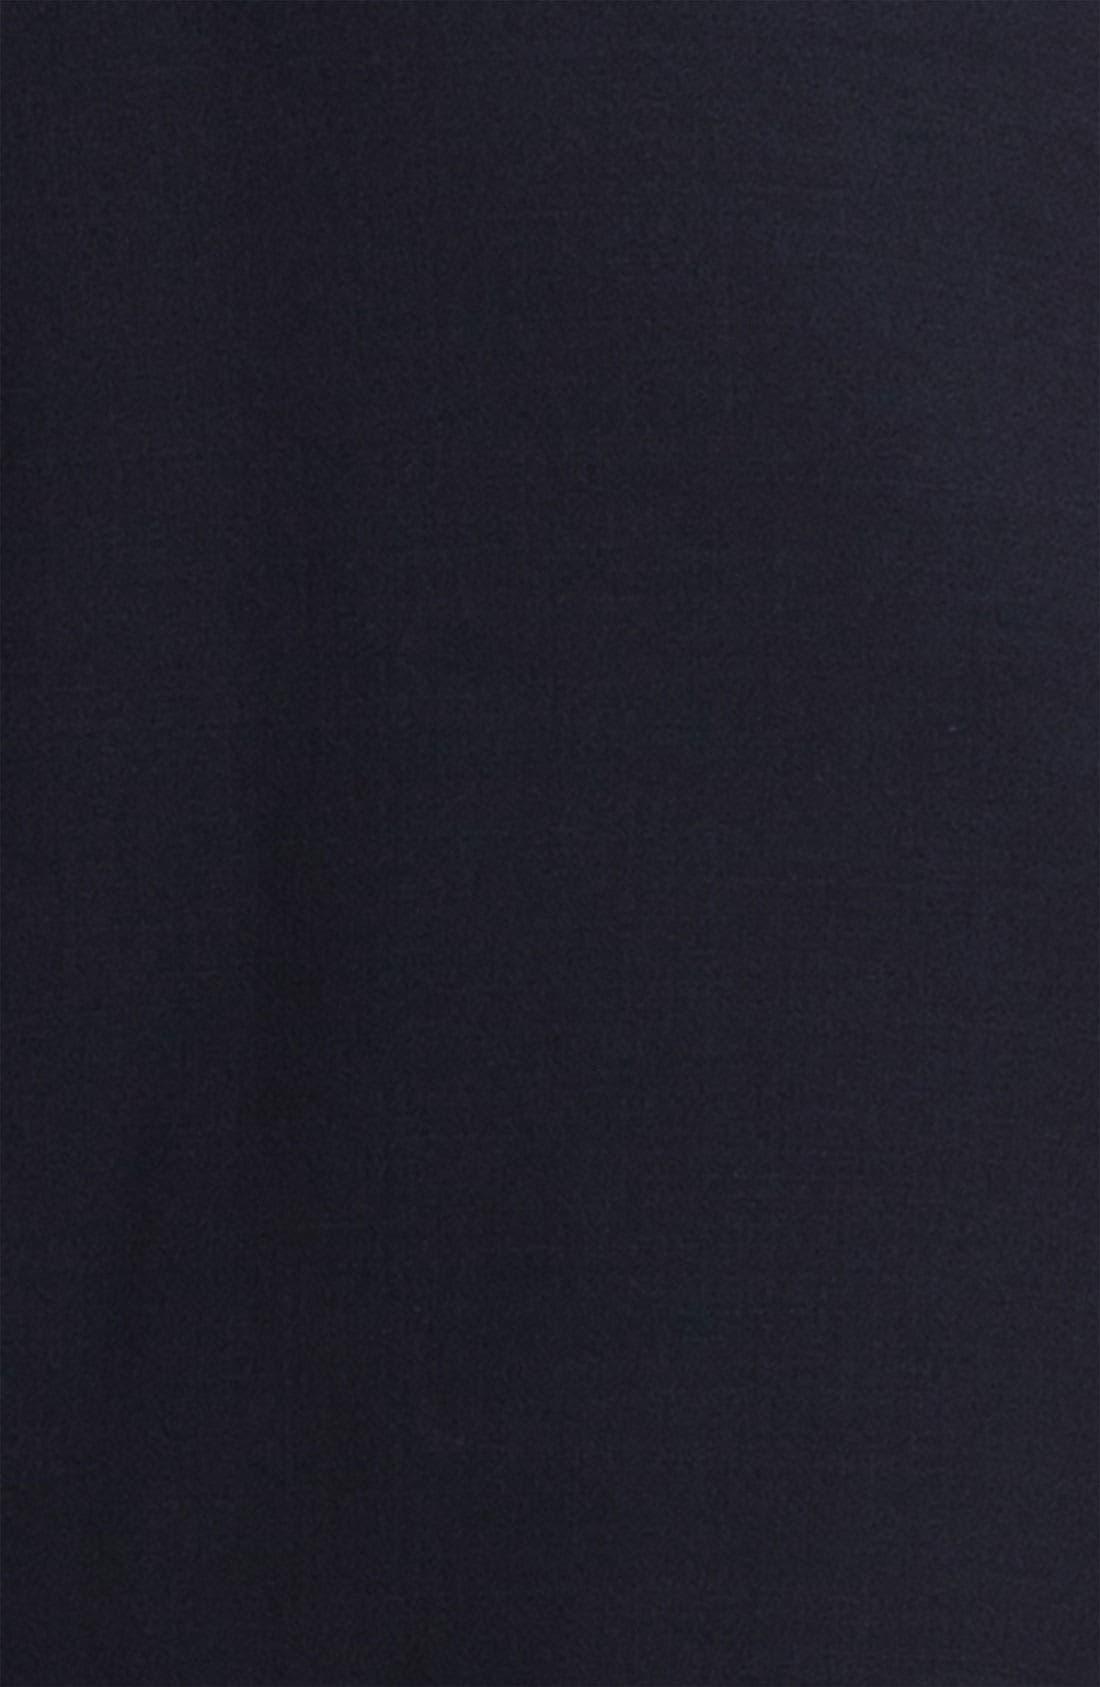 'Walsh' Wool Blend A-Line Dress,                             Alternate thumbnail 2, color,                             411